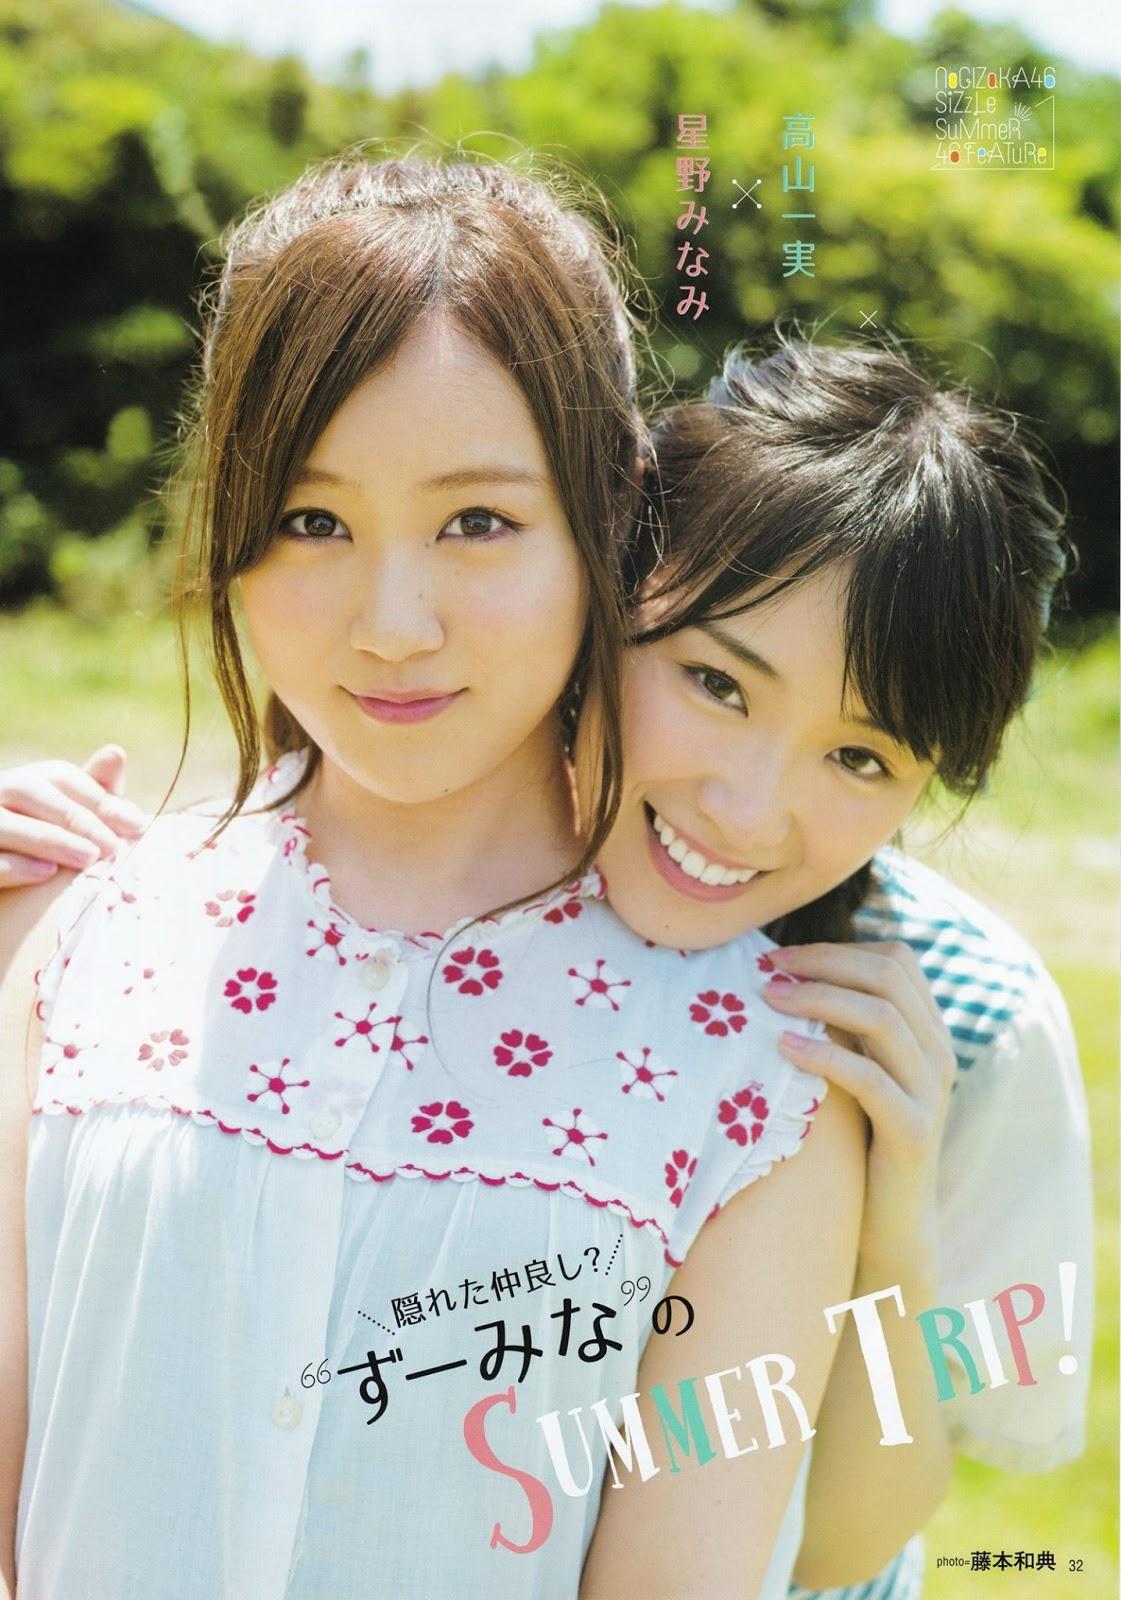 Hoshino Minami 星野みなみ, Takayama Kazumi 高山一実, B.L.T 2017年9月号